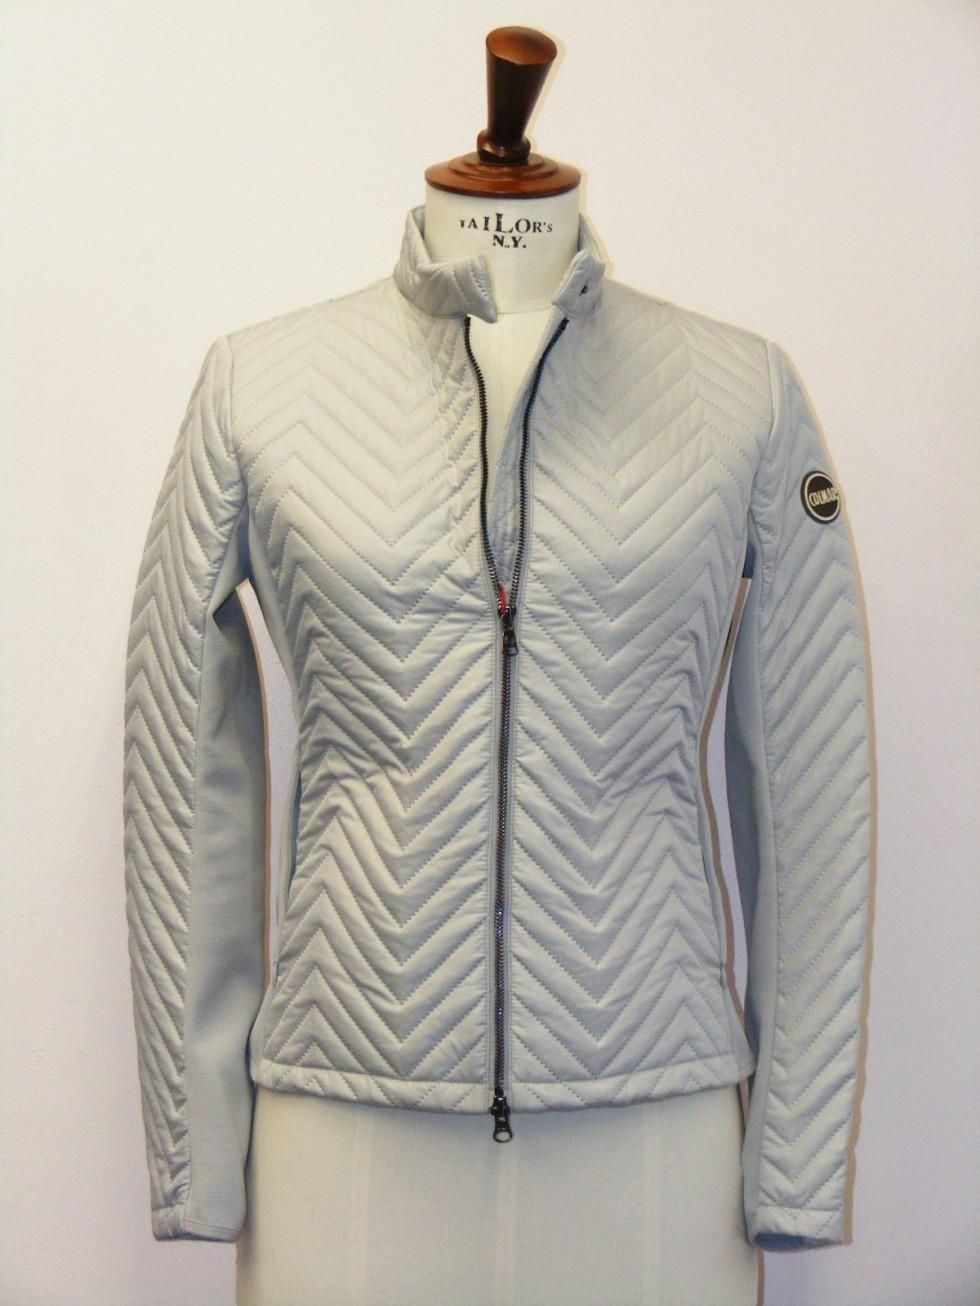 Donna Vendita Giacca Originals Colmar 2090 Abbigliamento Col 292 qBBCEY7xTw